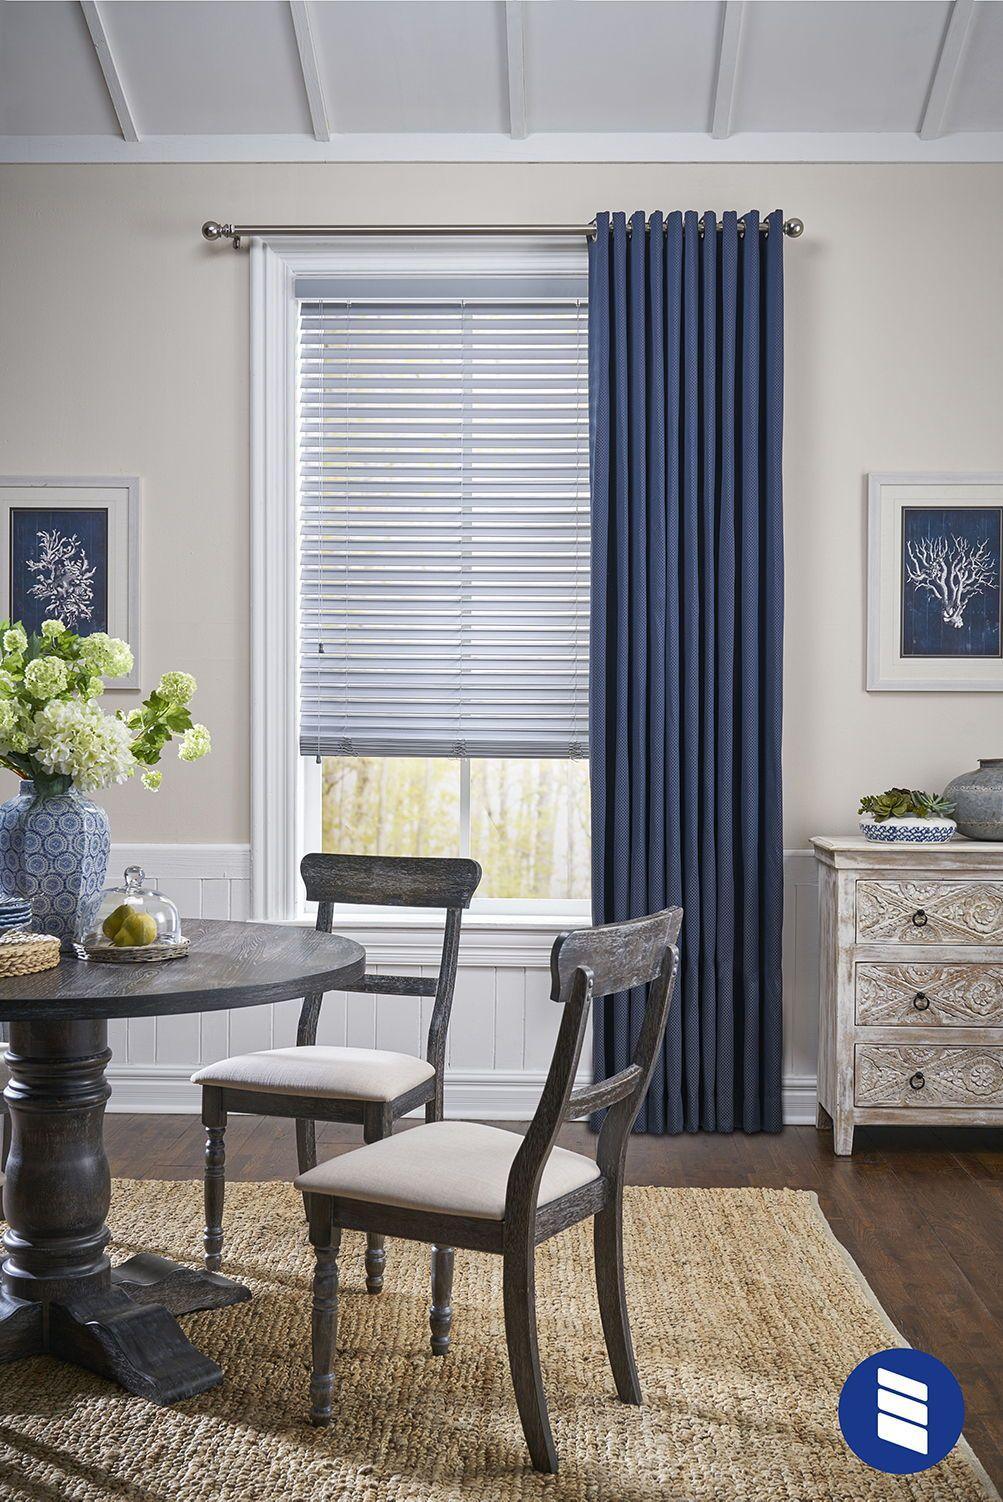 2 Room Darkening Fabric Blind Ev Dekoru Ev Dekorasyonu Perdeler